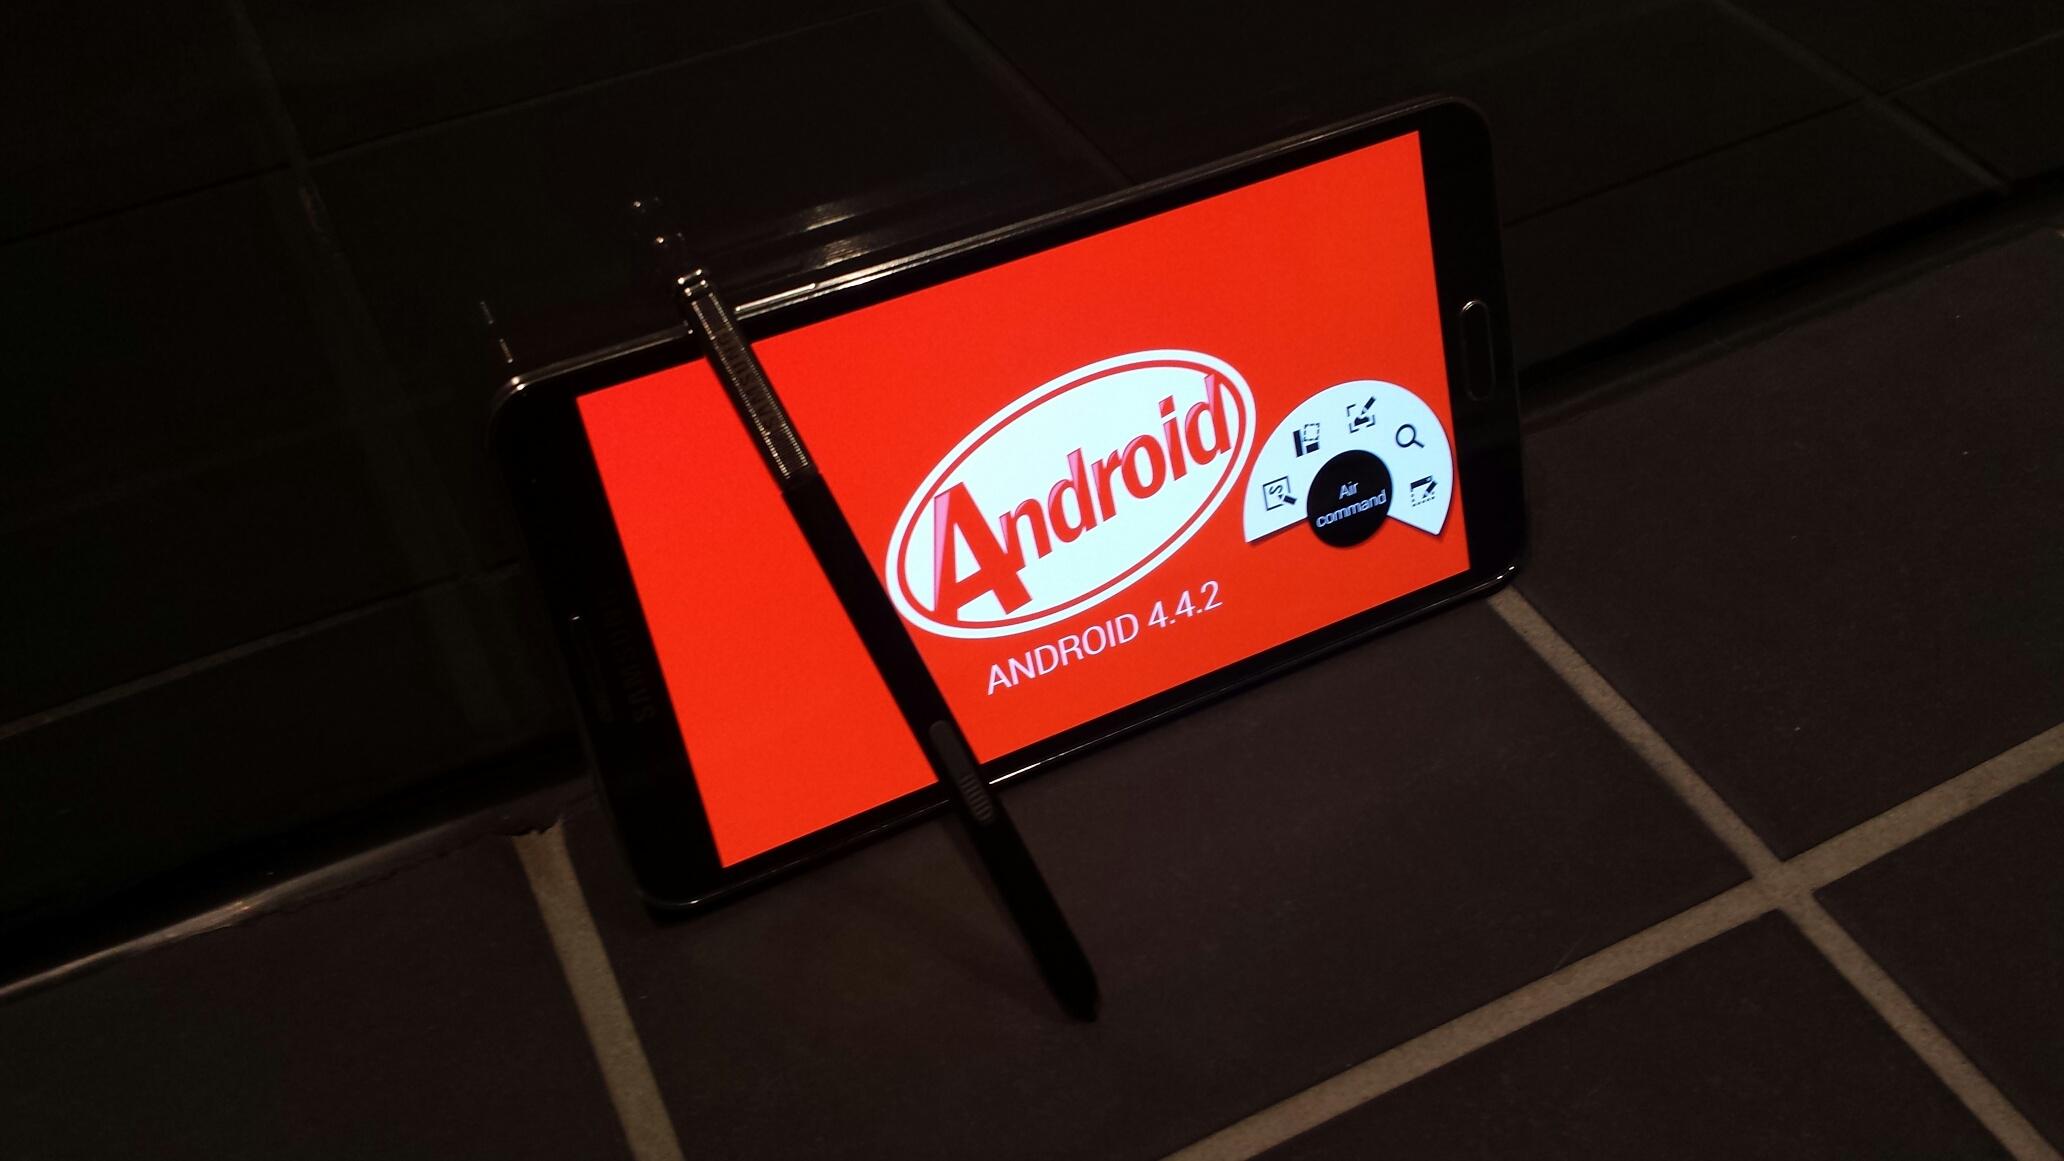 Photo of روم كيت كات 4.4.2 جلكسي نوت 3 الرسمي | Galaxy Note 3 (SM-N9005)